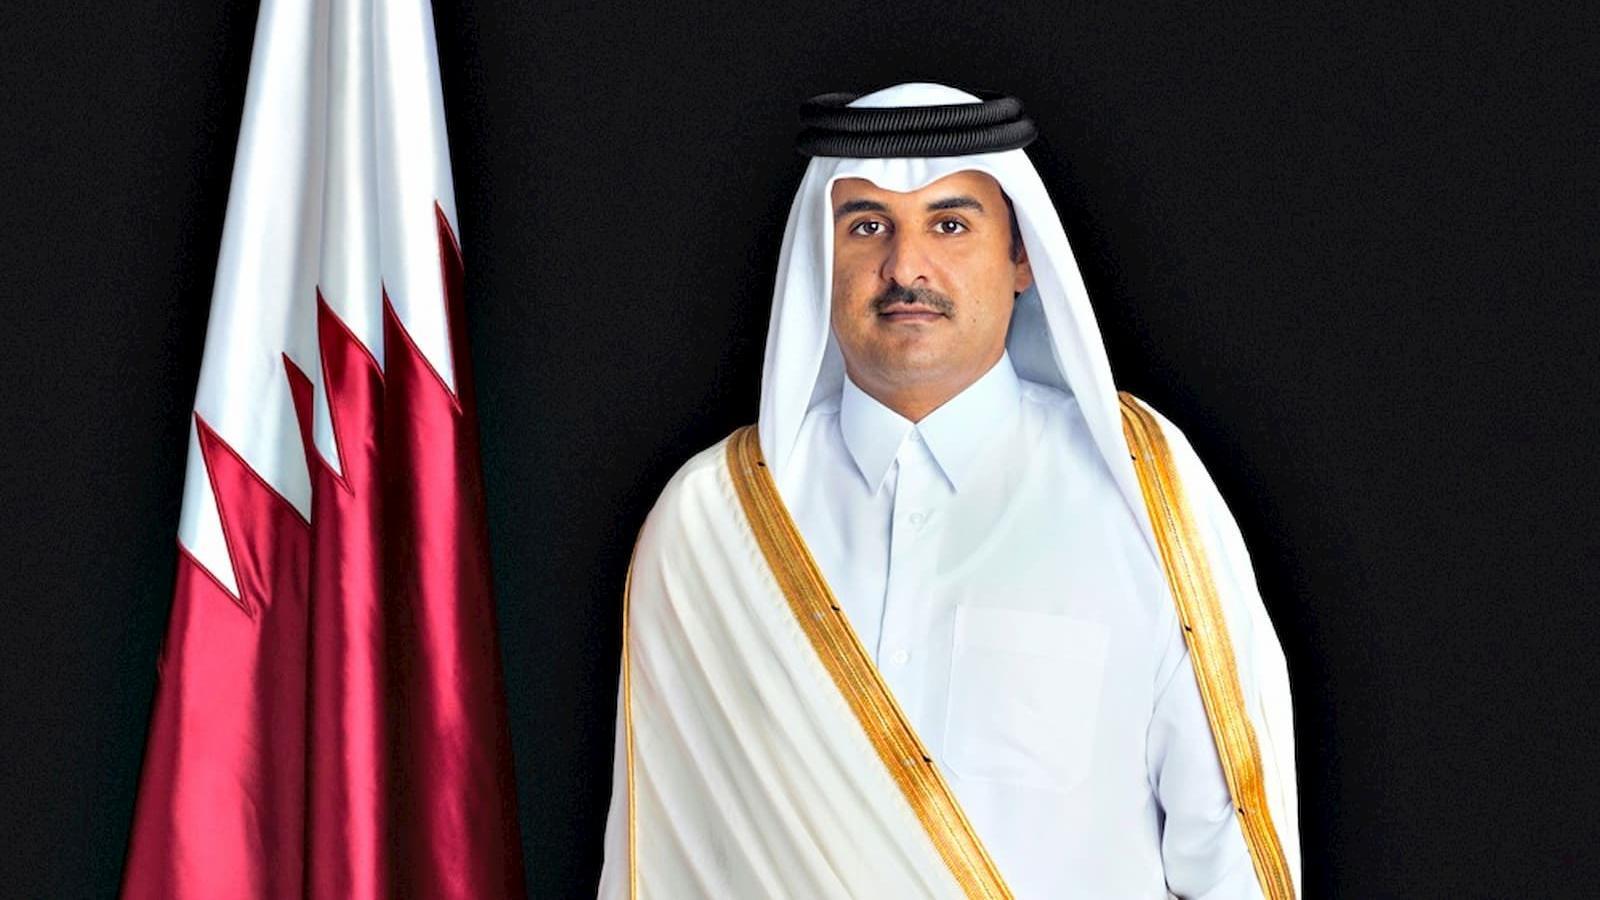 HH the Amir affirms Qatar's firm support to Palestine